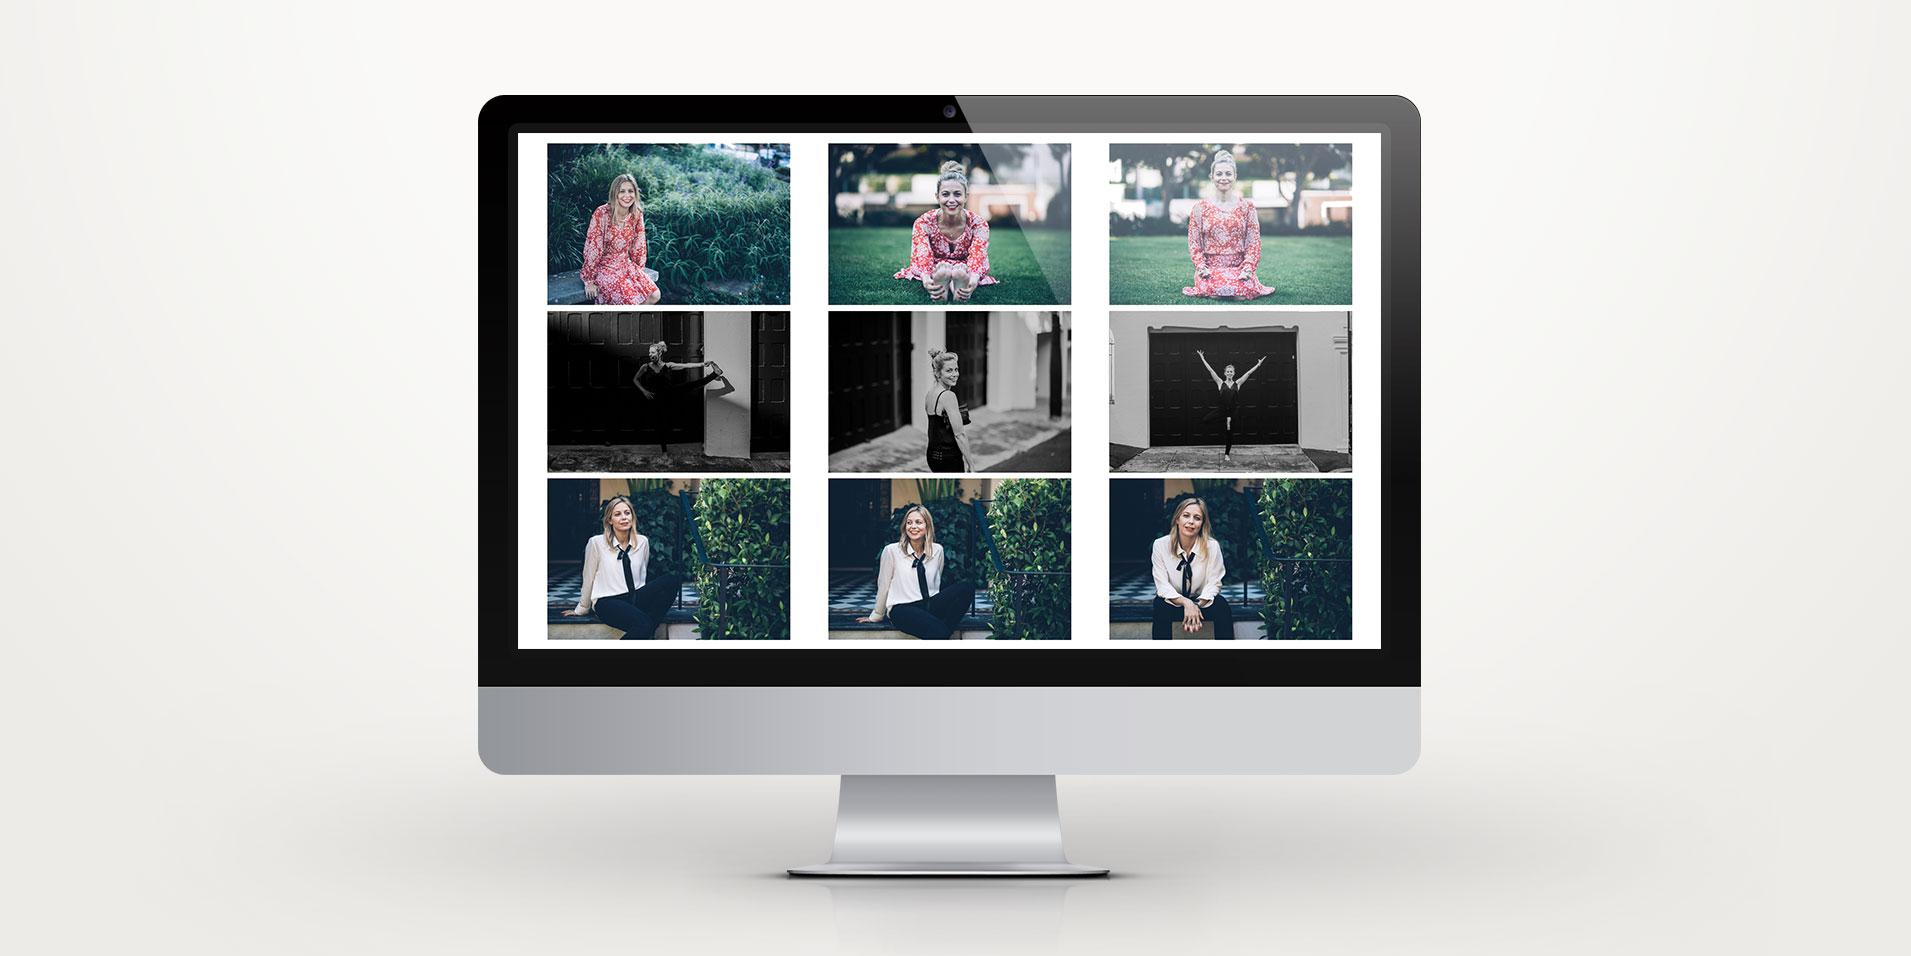 rachael-coopes-website-6-1911x956.jpg